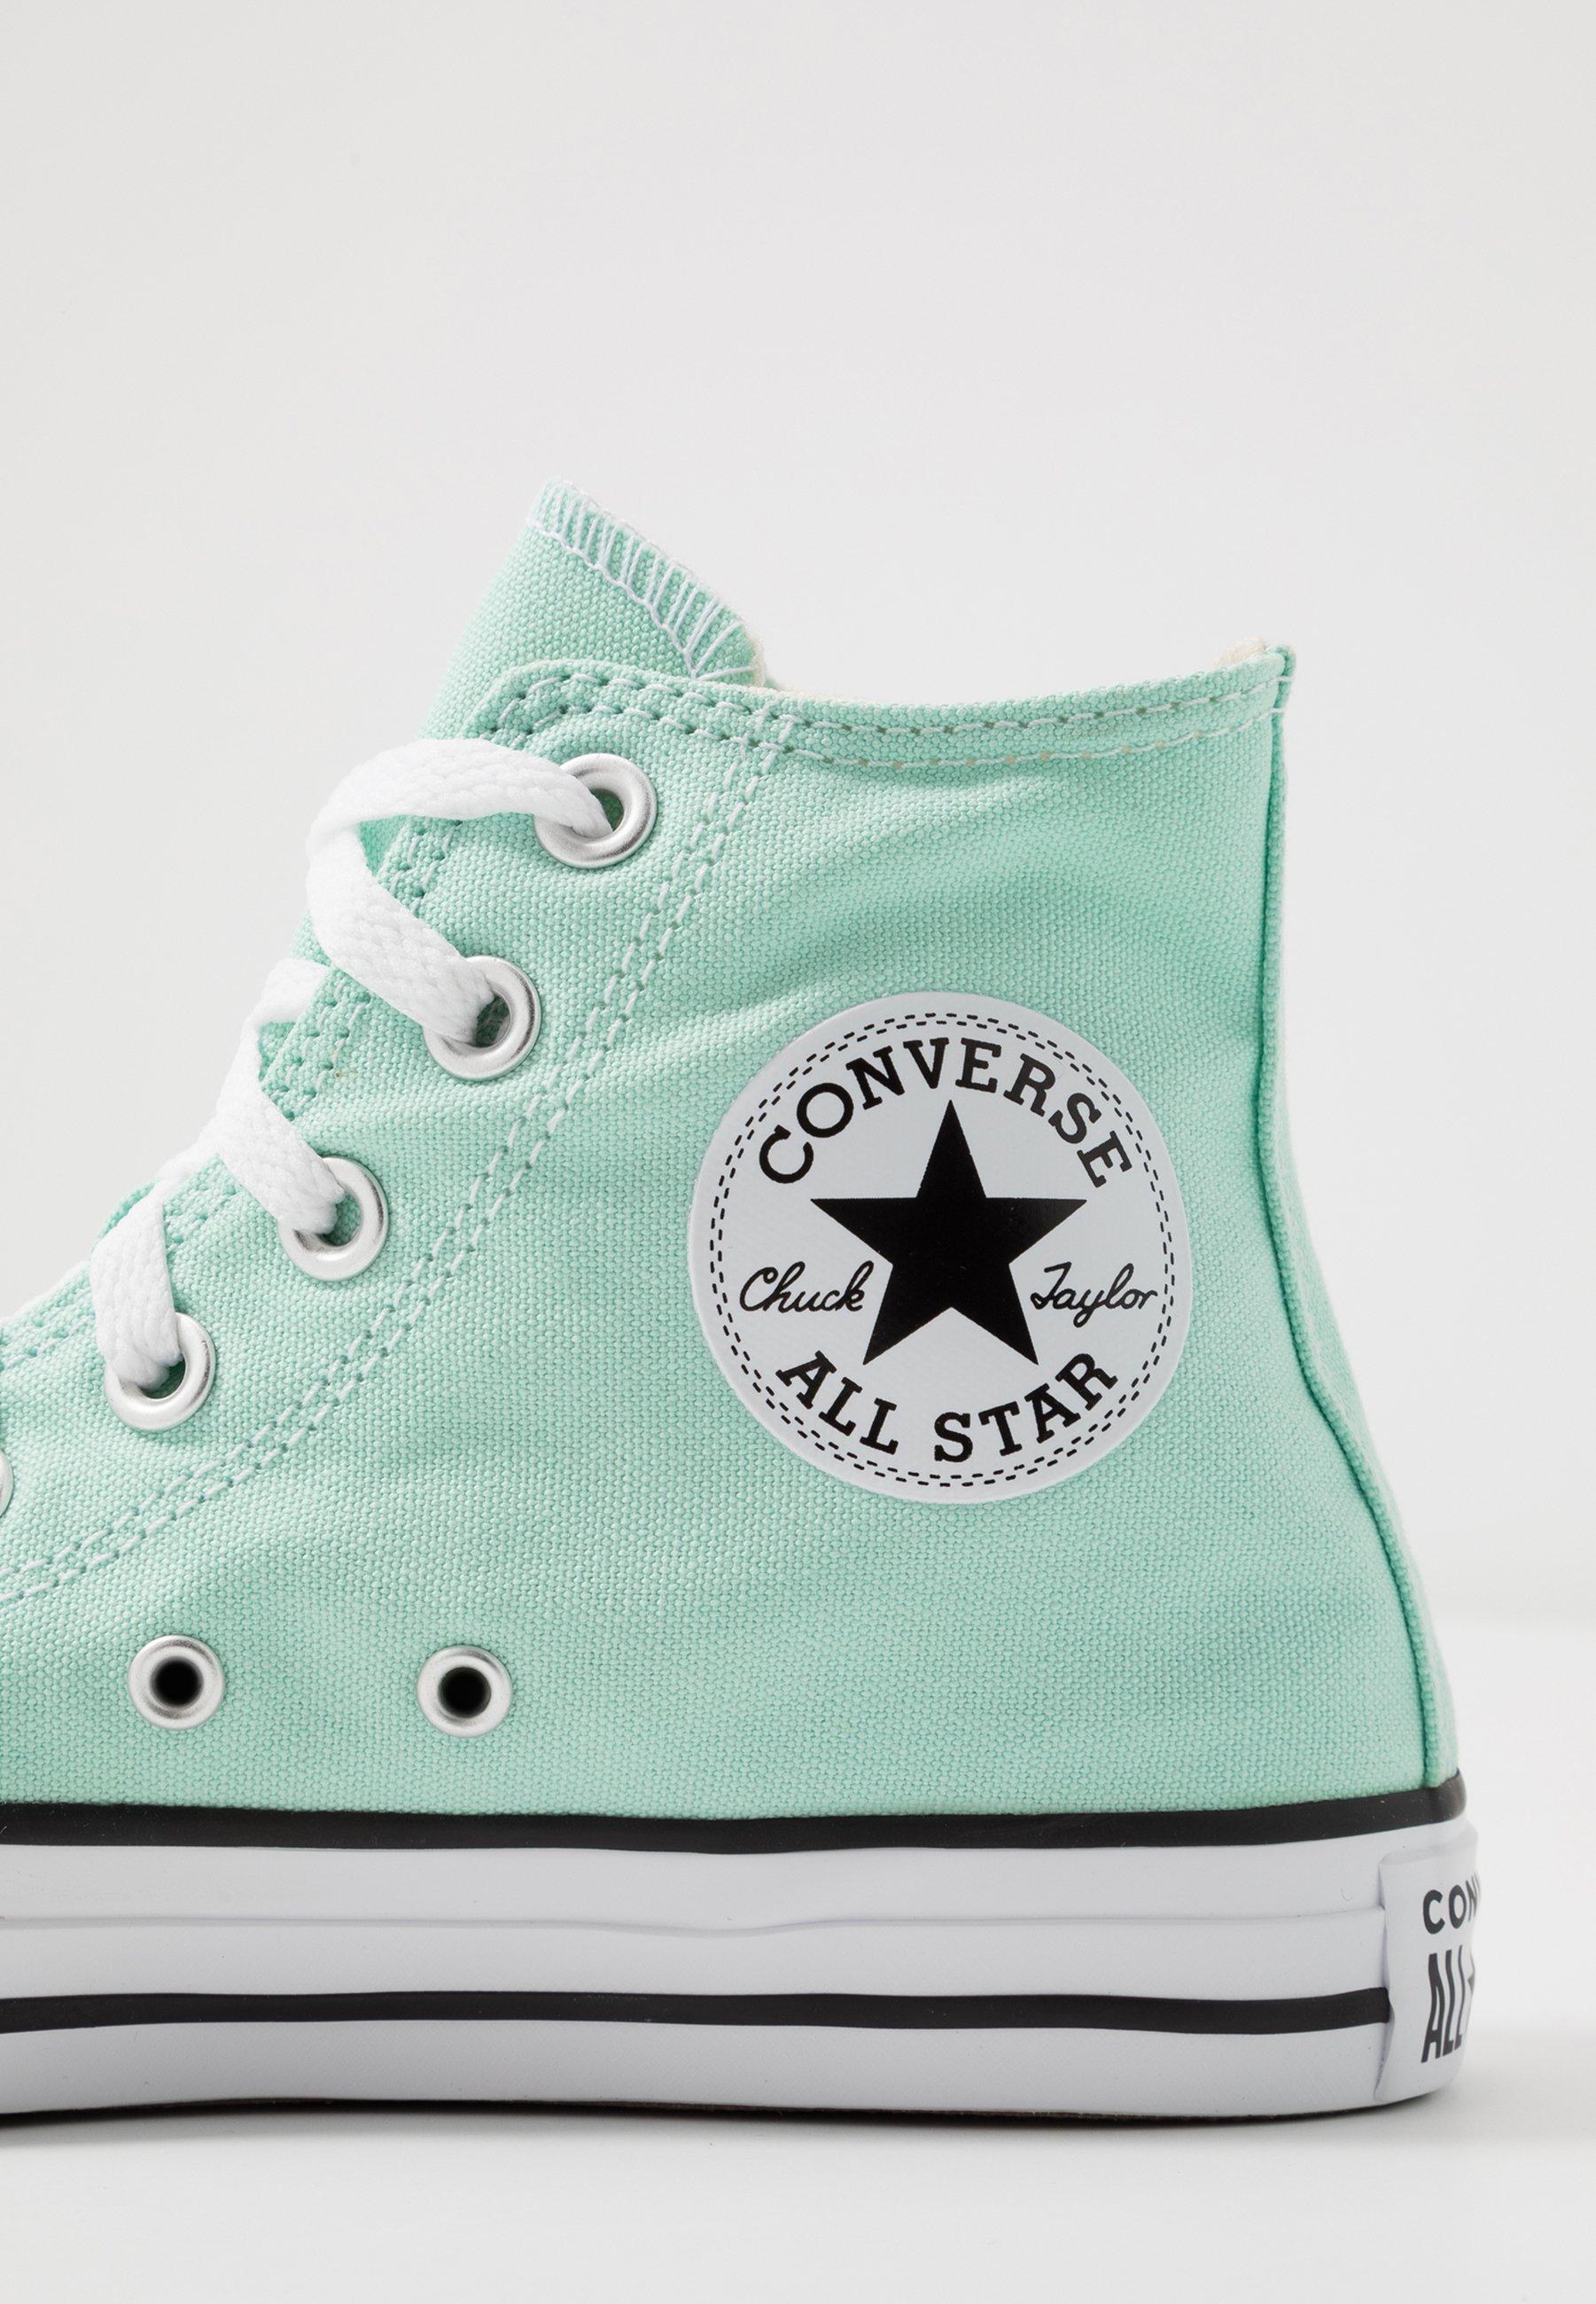 Converse CHUCK TAYLOR ALL STAR RENEW Joggesko ocean mint